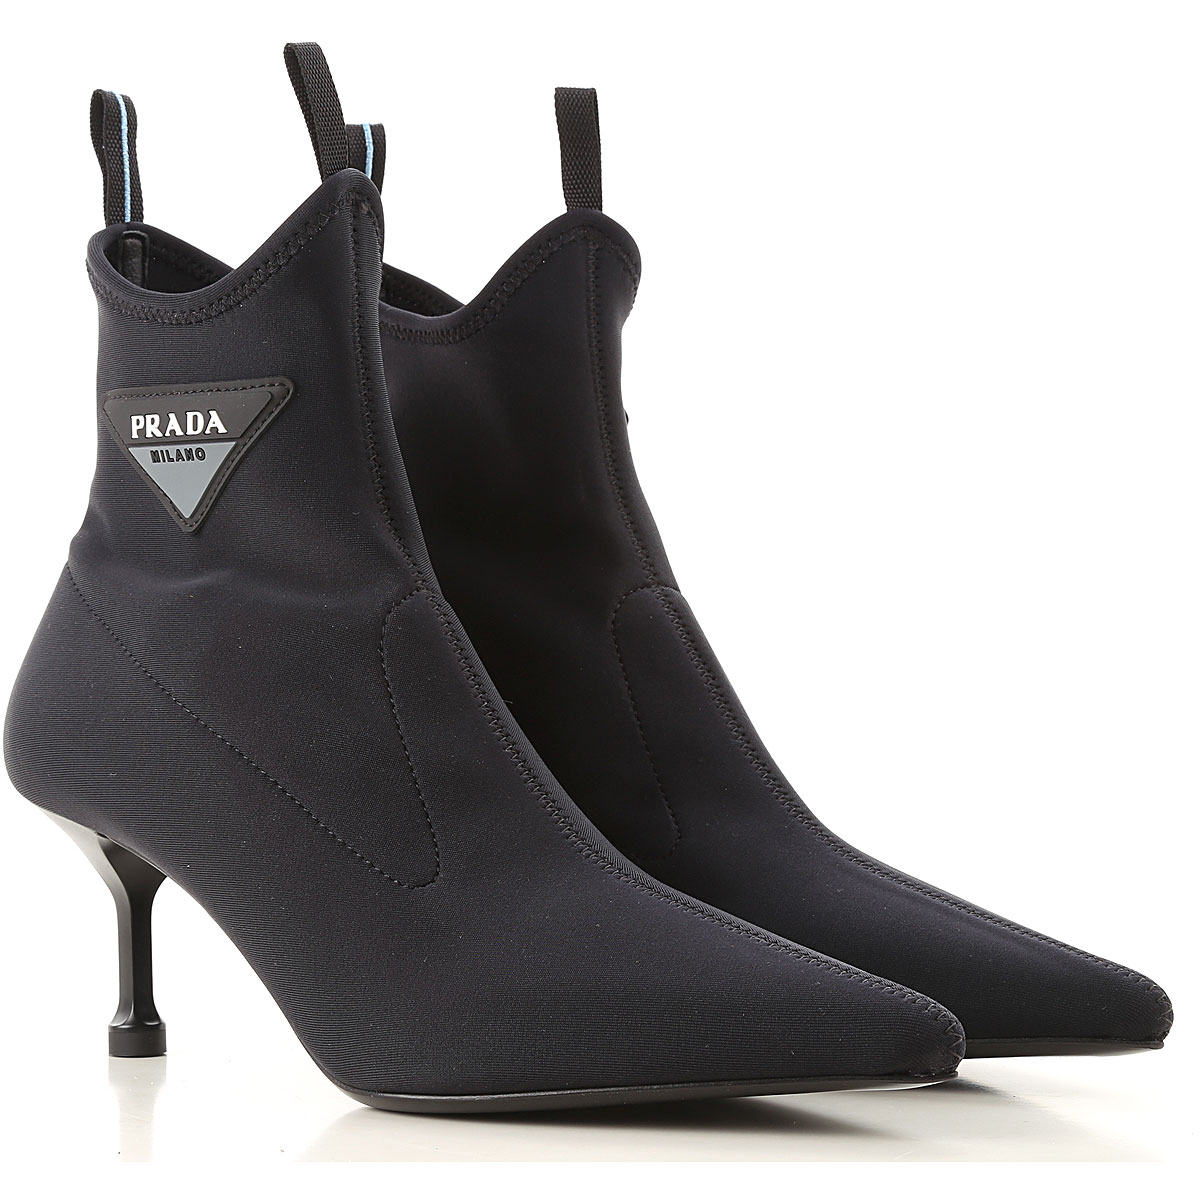 a7d070c28b Sapatos Femininos Prada